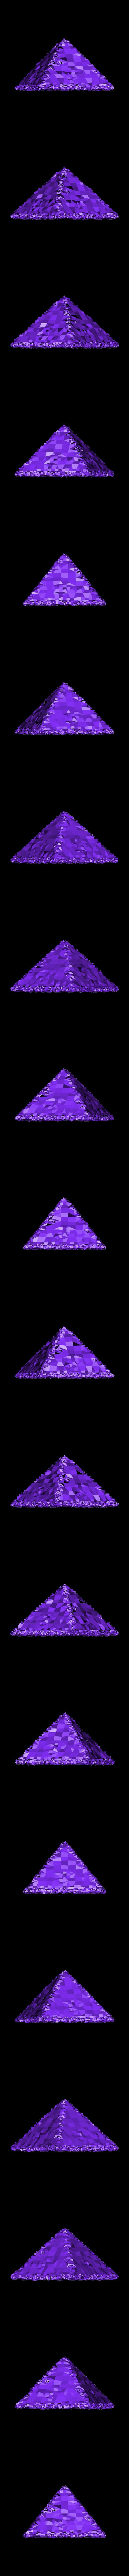 me_5.obj Descargar archivo OBJ Petrified Pyramid • Modelo imprimible en 3D, miguelonmex